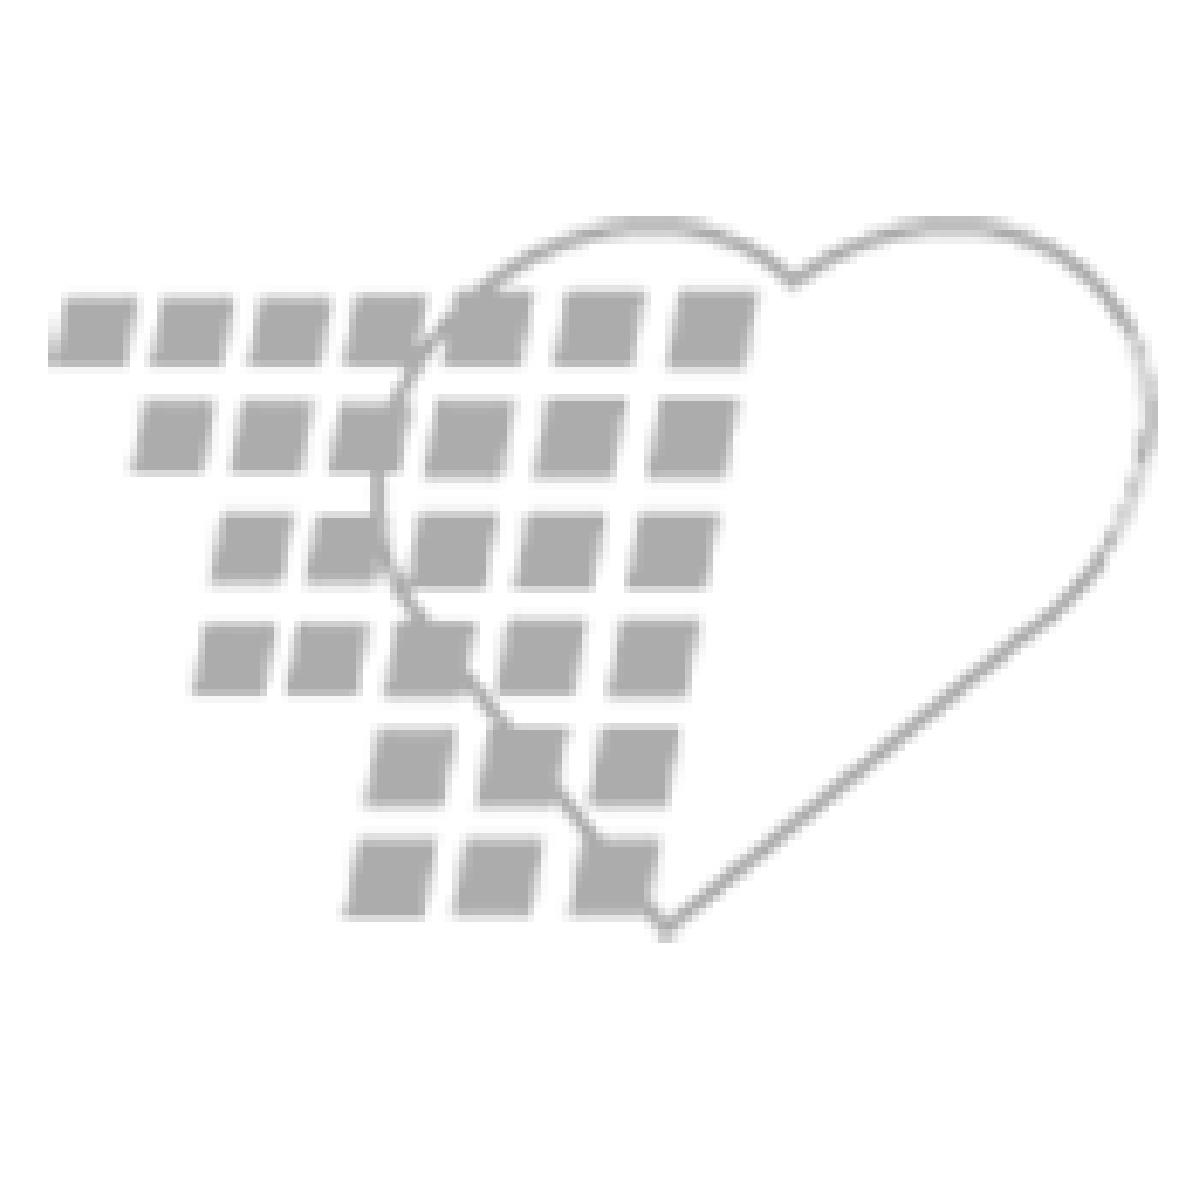 03-47-1096 Clear PETG Plastic Glove Disp Non-Returnable